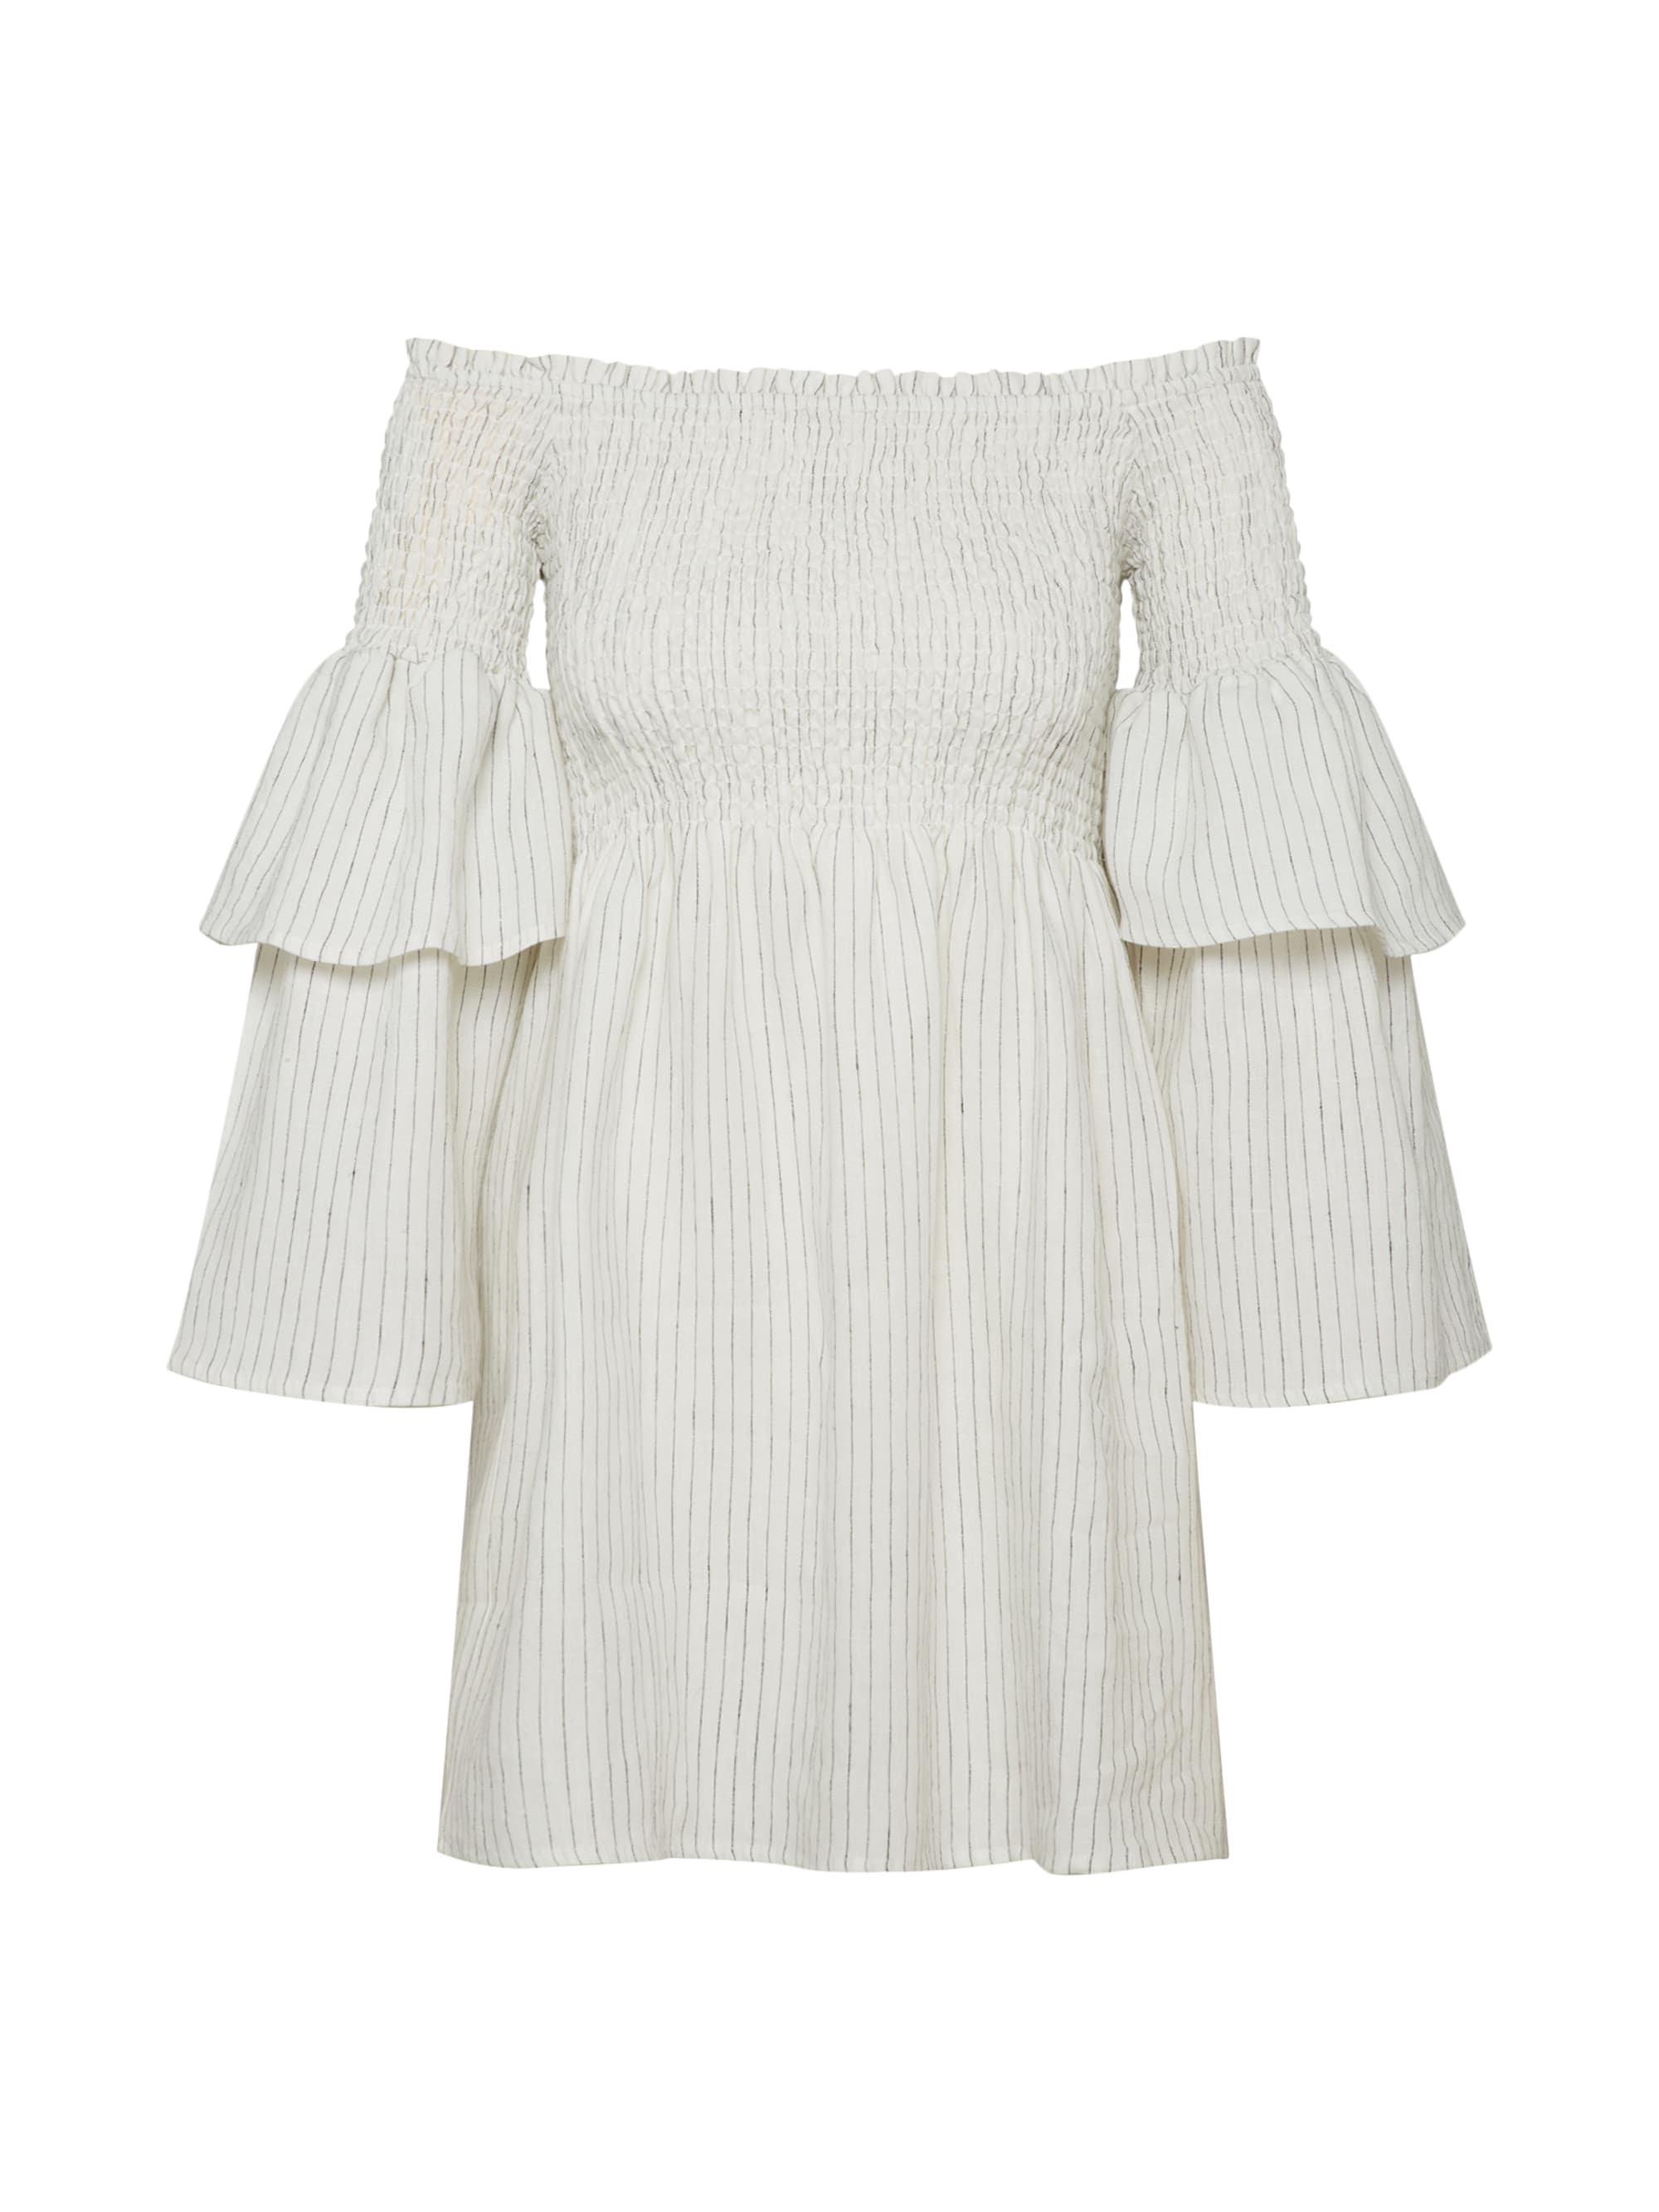 bardot - Kleid